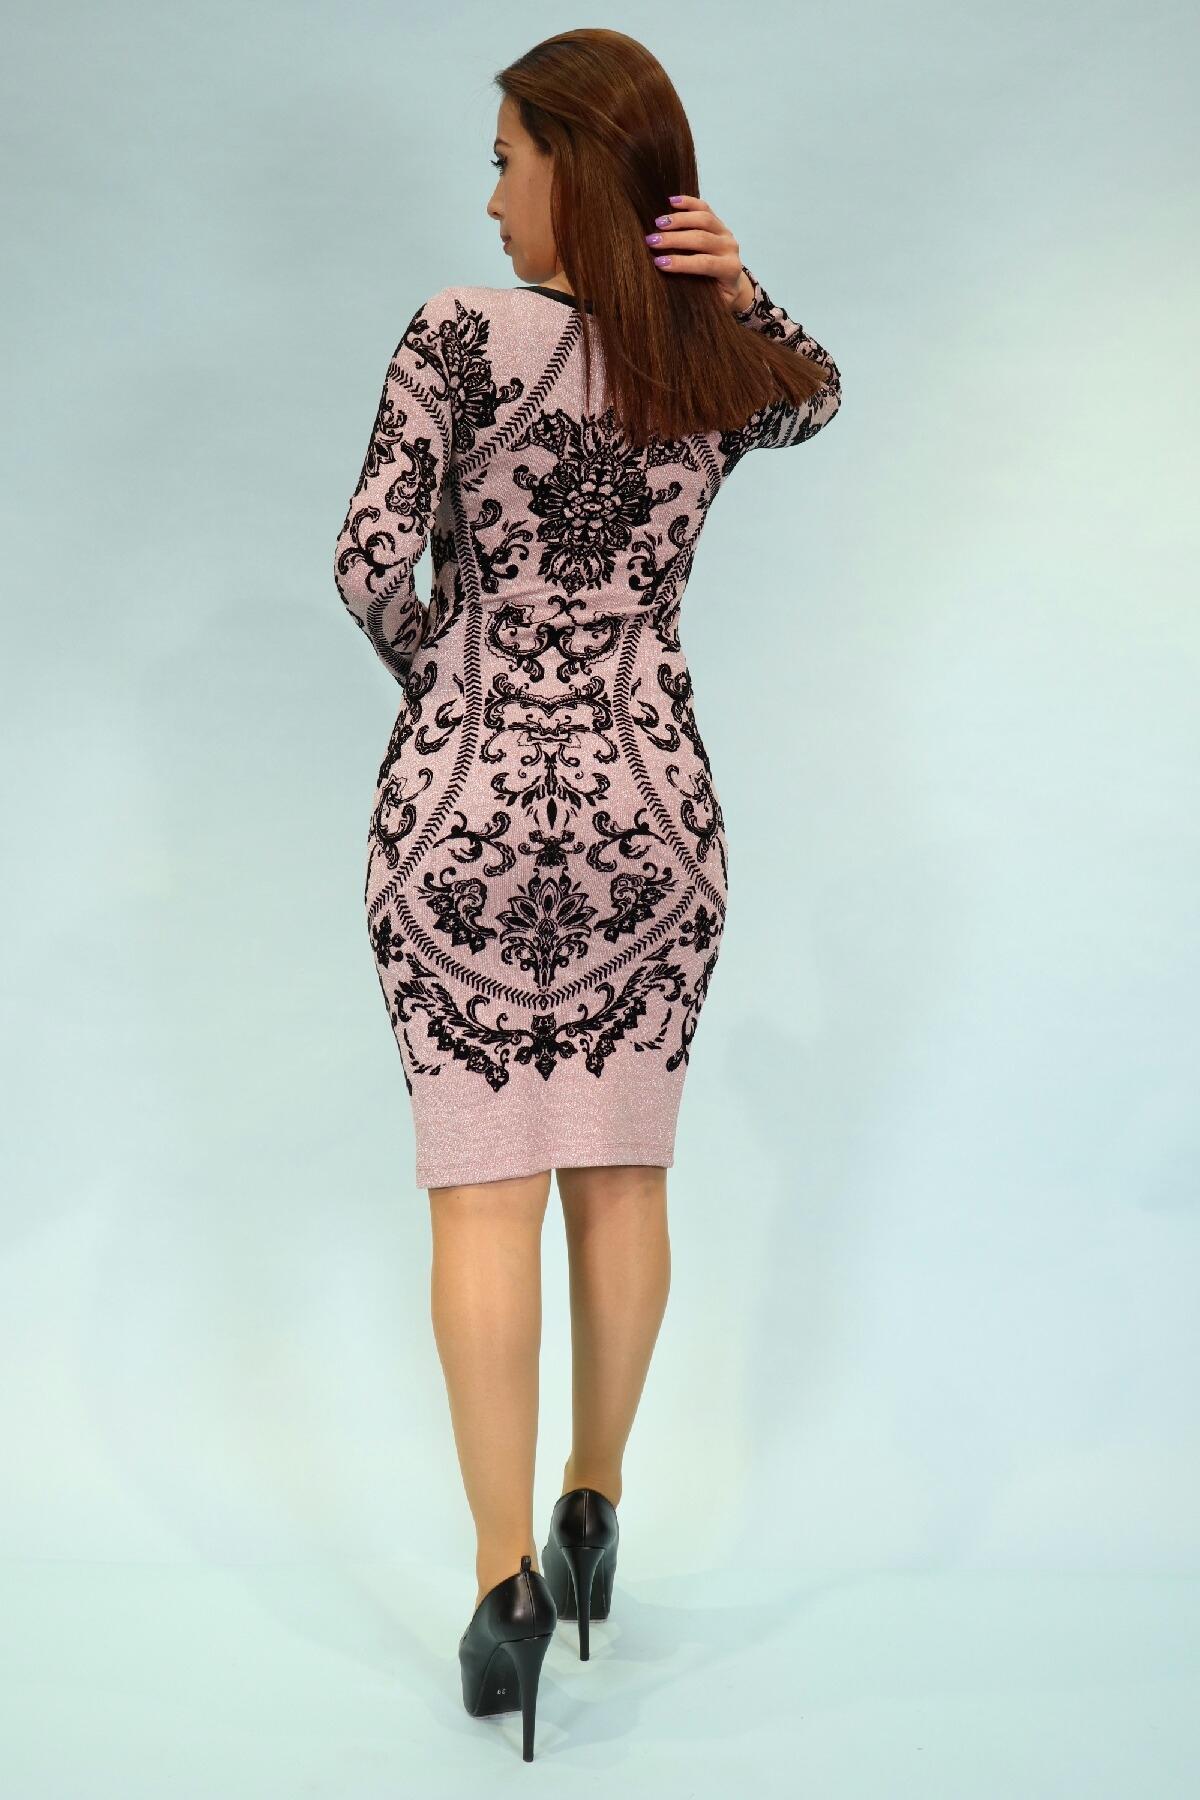 Day Dresses Medium-powder pink